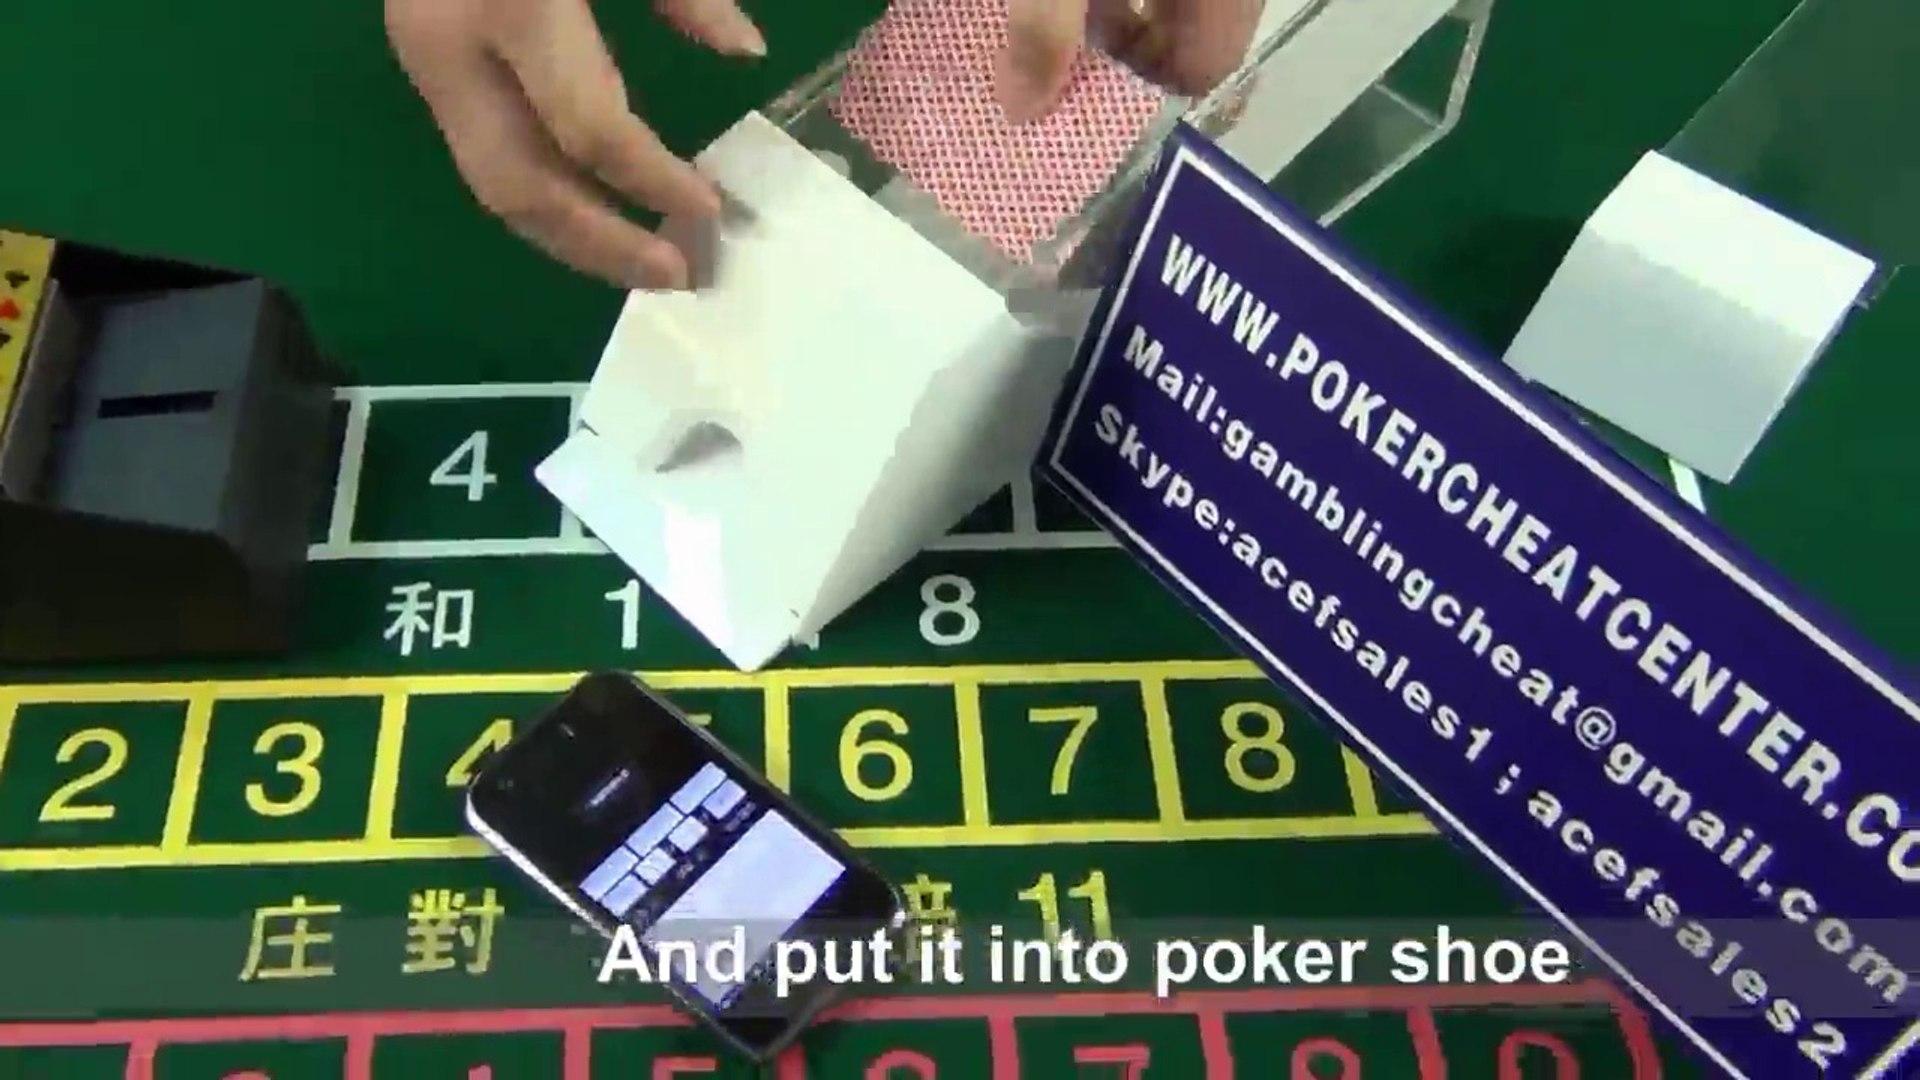 Gambling prevalence survey 2010